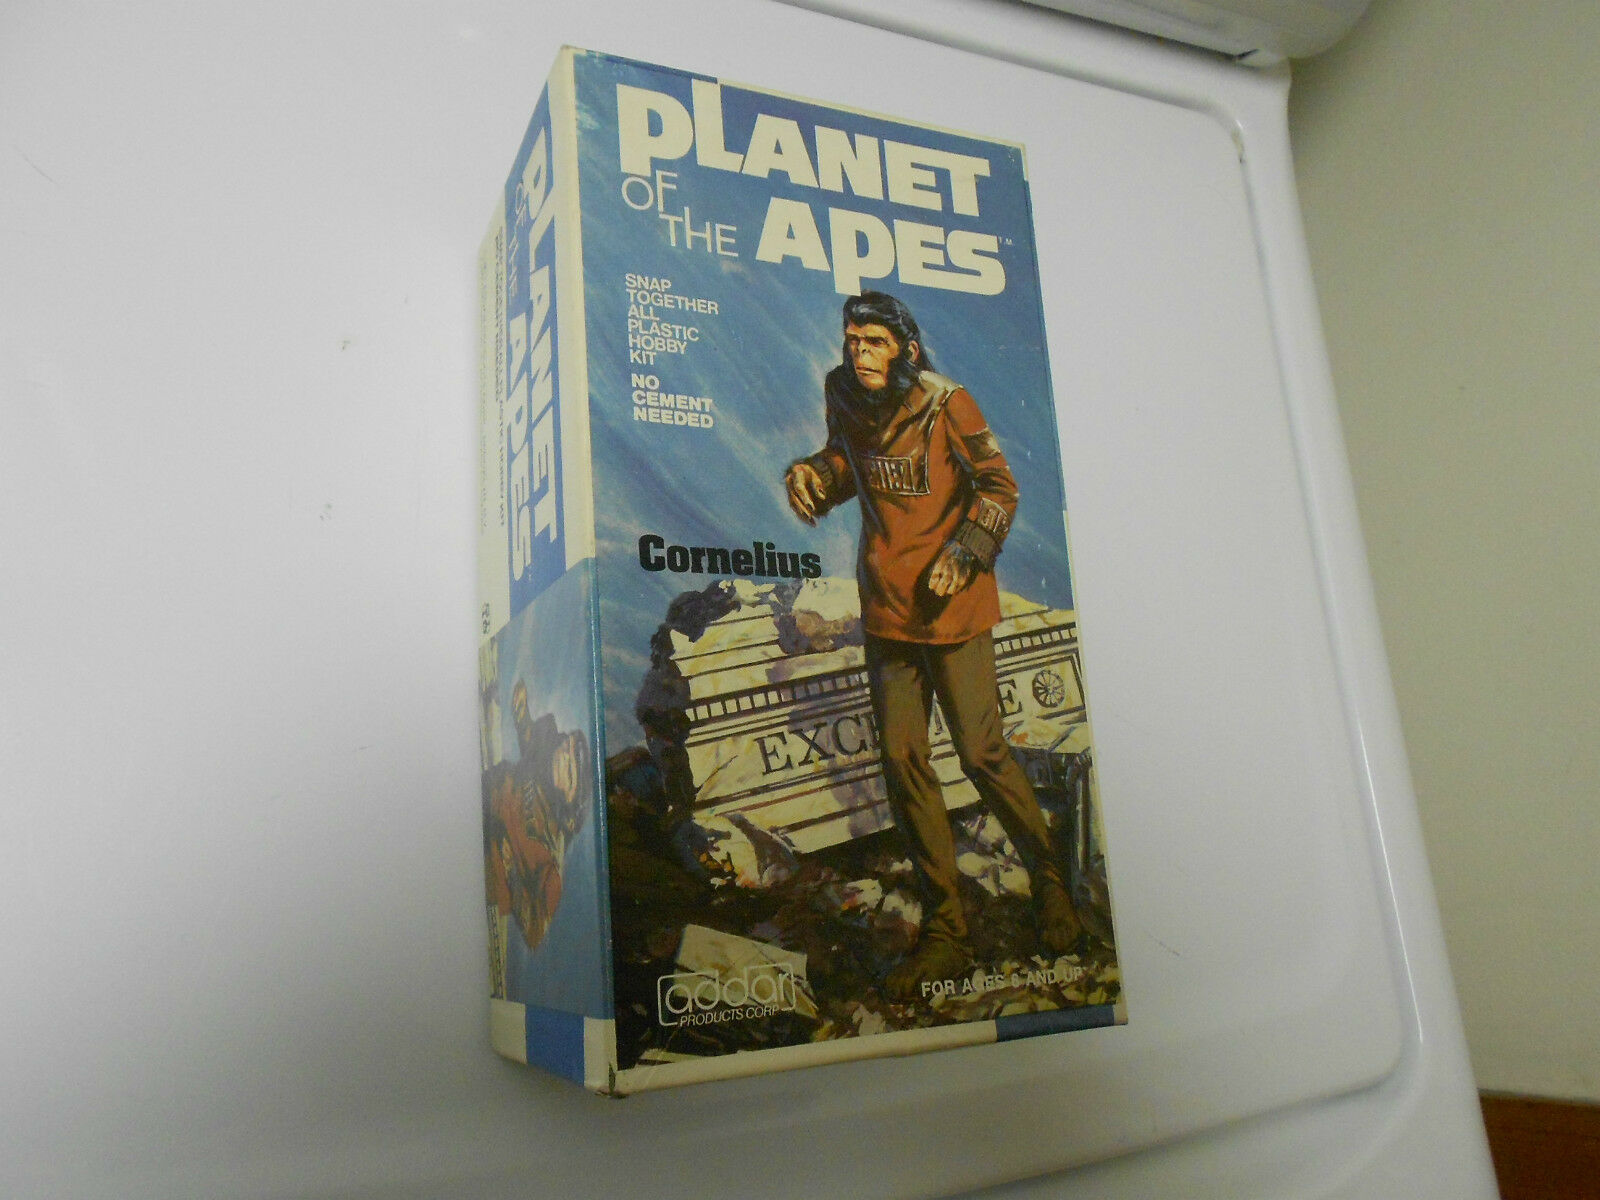 1973 Planet Of The Apes CORNELIUS Plastic Model Hobby KIT ADDAR POTA 101-250